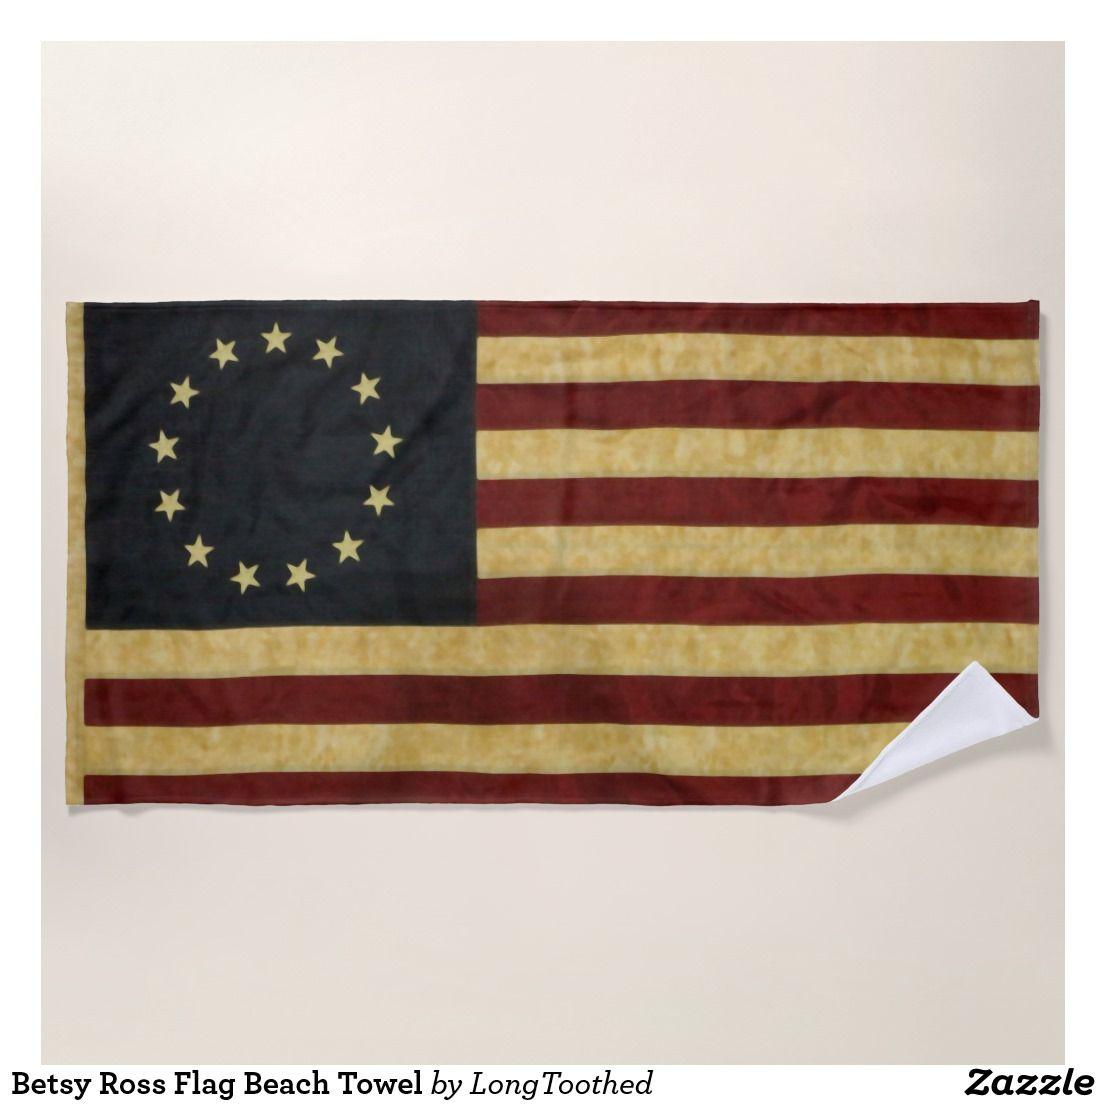 Betsy Ross Flag Beach Towel Zazzle Com Beach Towel Flag Towel